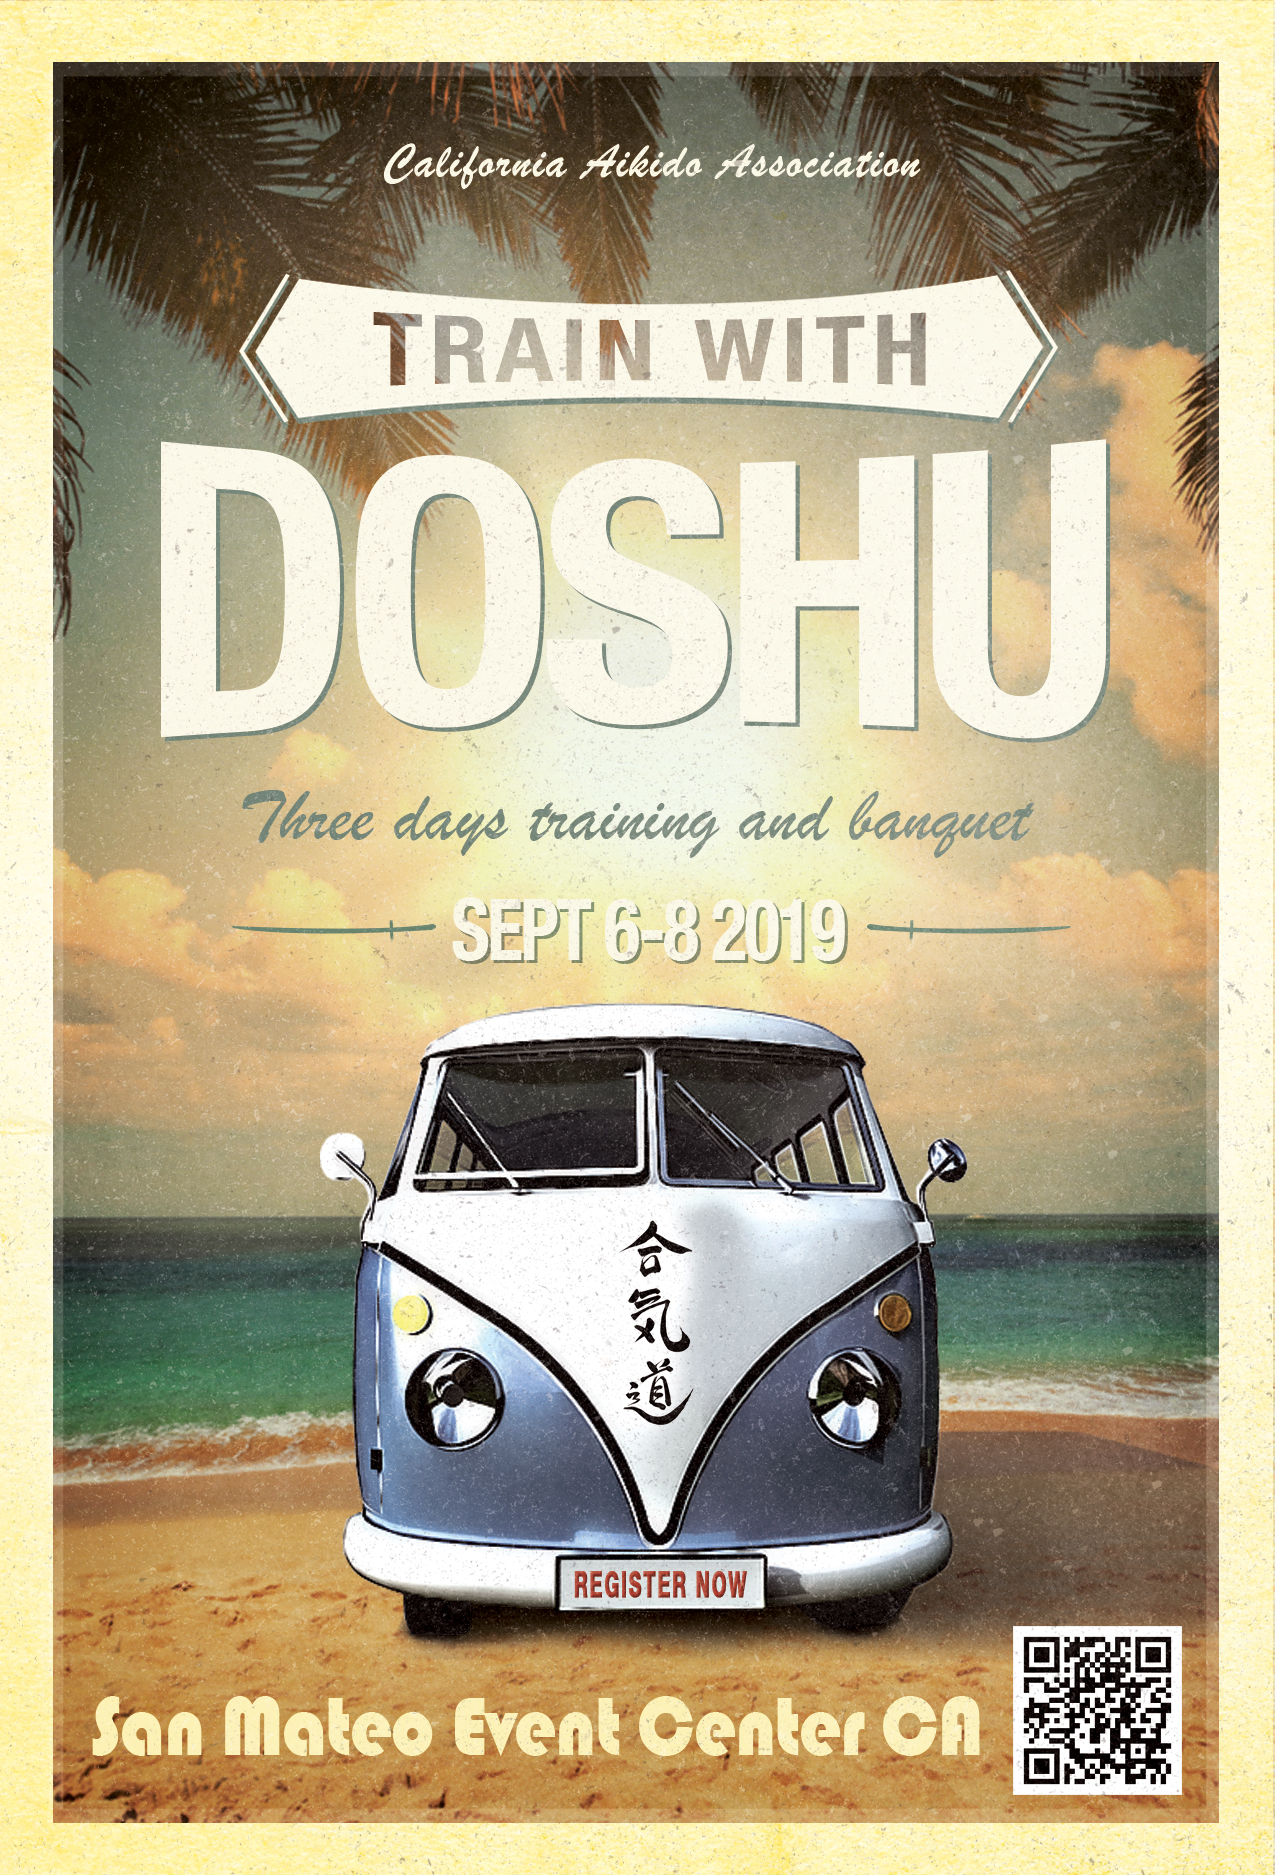 DOSHU FLYER 2019 FINAL.jpg